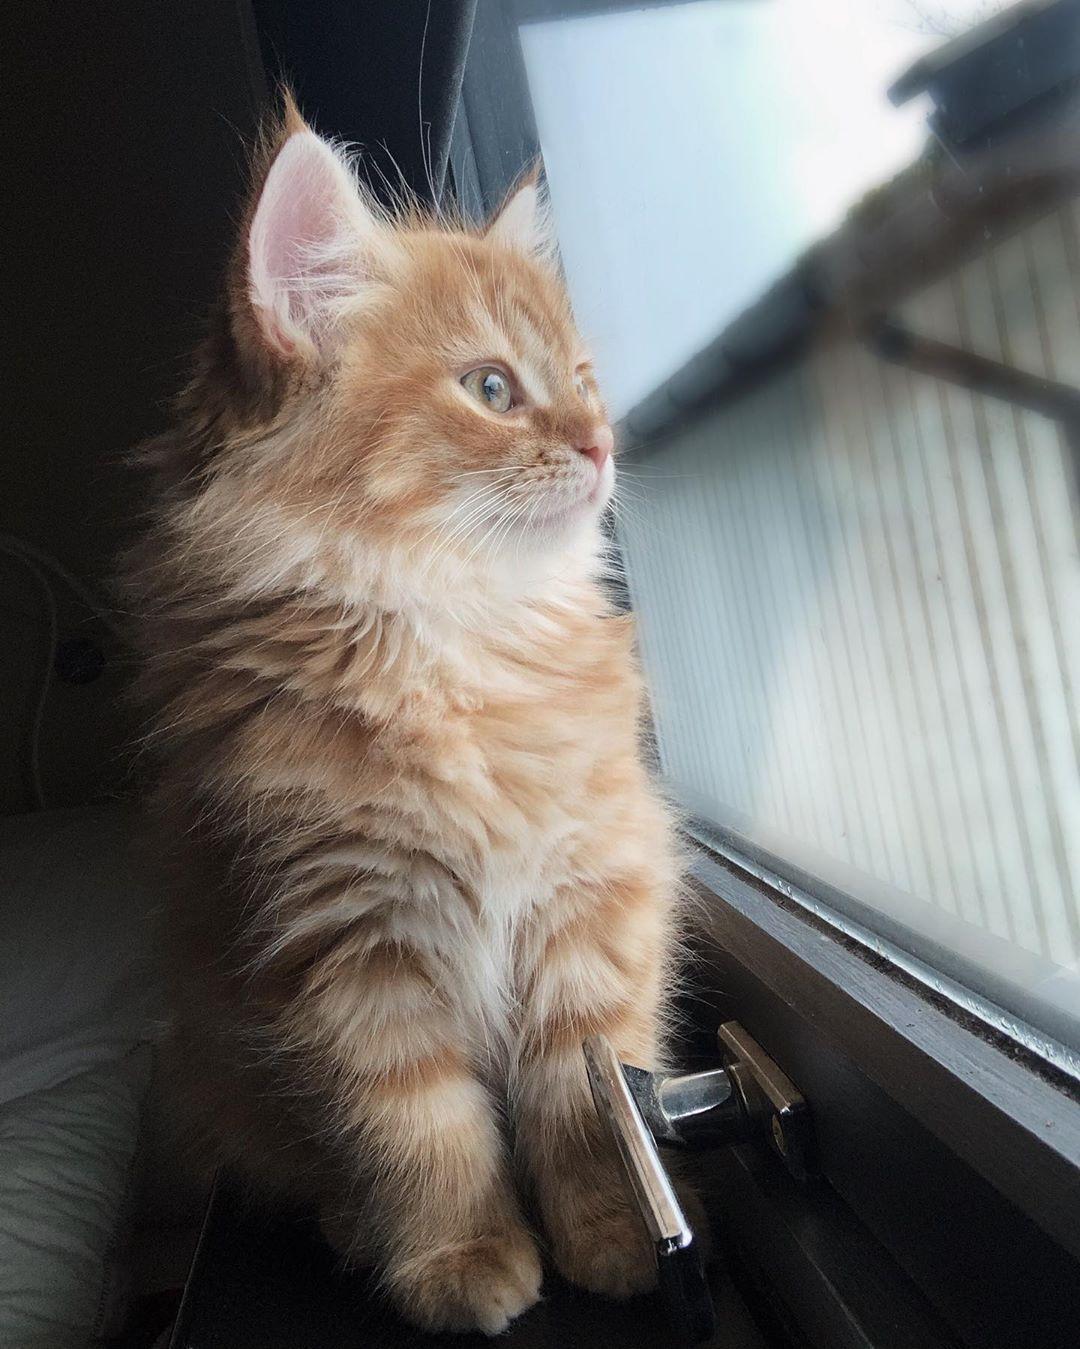 Instagram Bridge Looking Forward To New Adventures Simba Cat Fluffy Lion Catlovers Catlife Crazycatlady Catsofinstagram Adve Cats Cat Day Cat Lovers